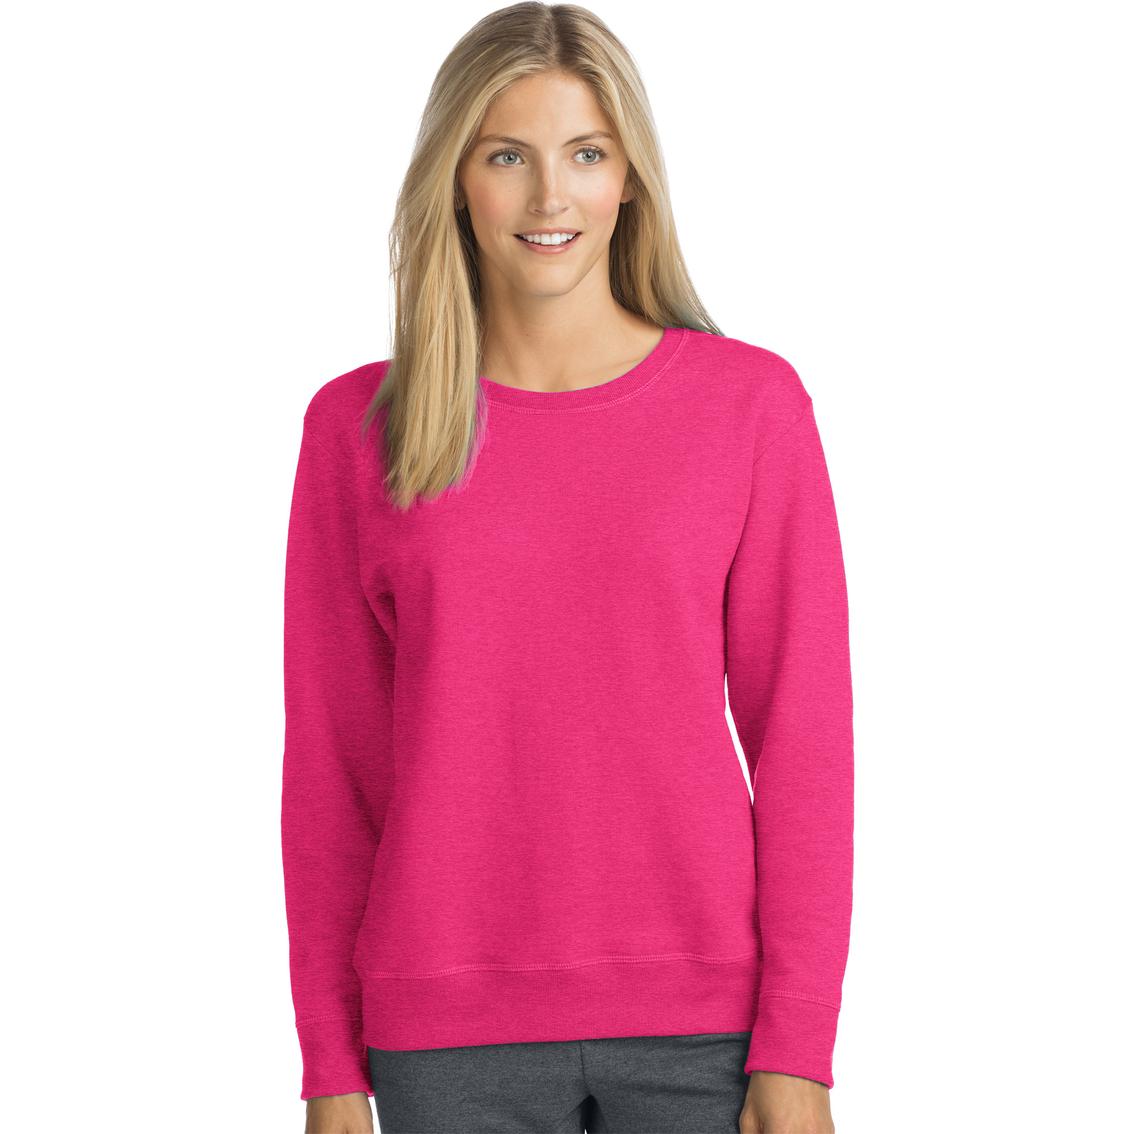 515b4a6a063 Hanes Comfortsoft Ecosmart Crewneck Sweatshirt